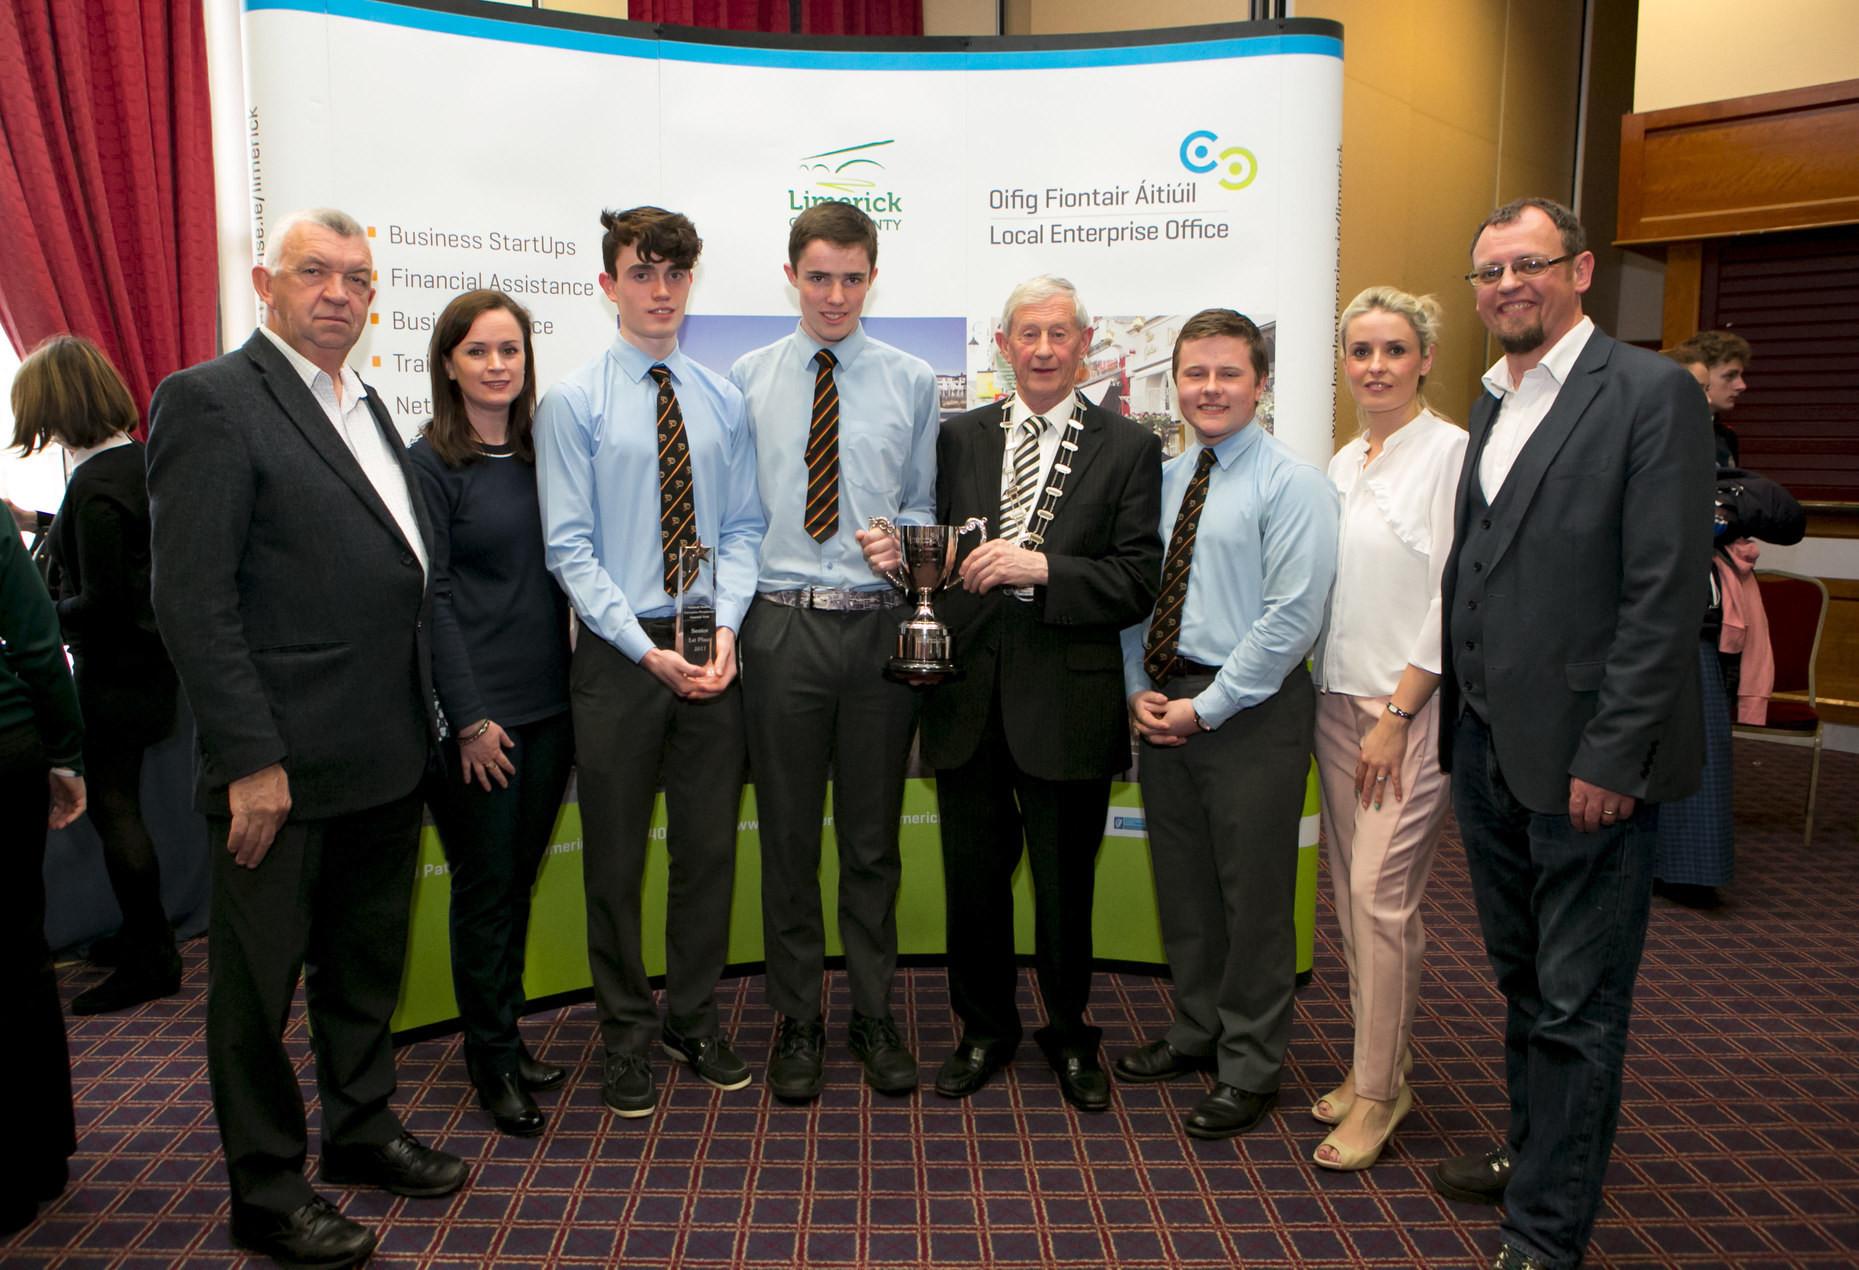 Limerick Student Entrepreneurs of the Year 2017